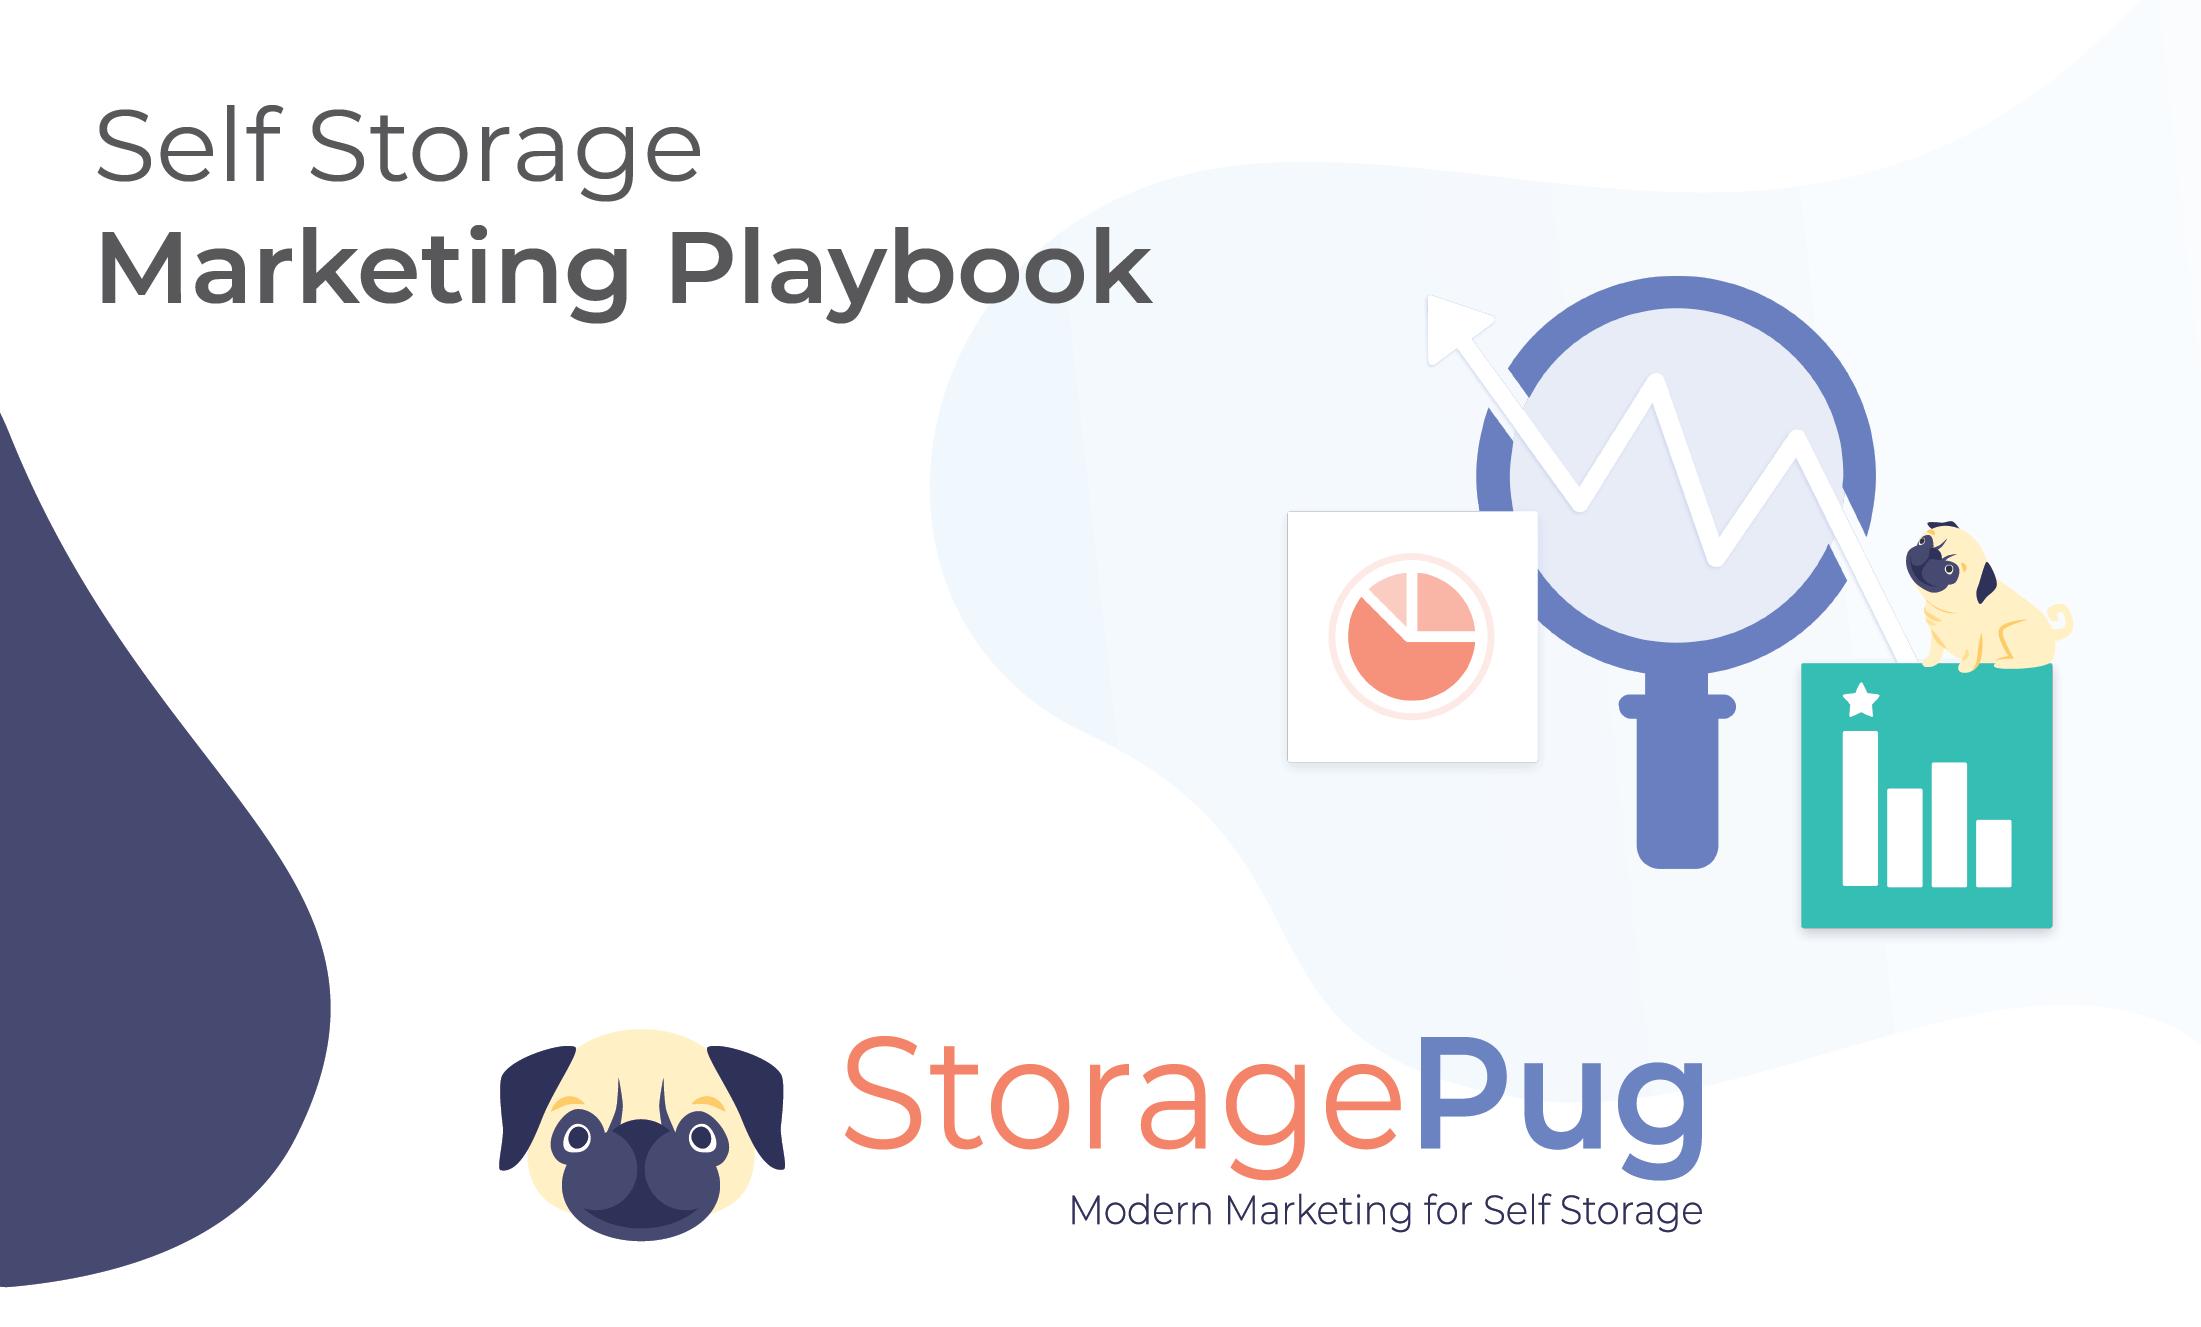 Self Storage Marketing Playbook 2